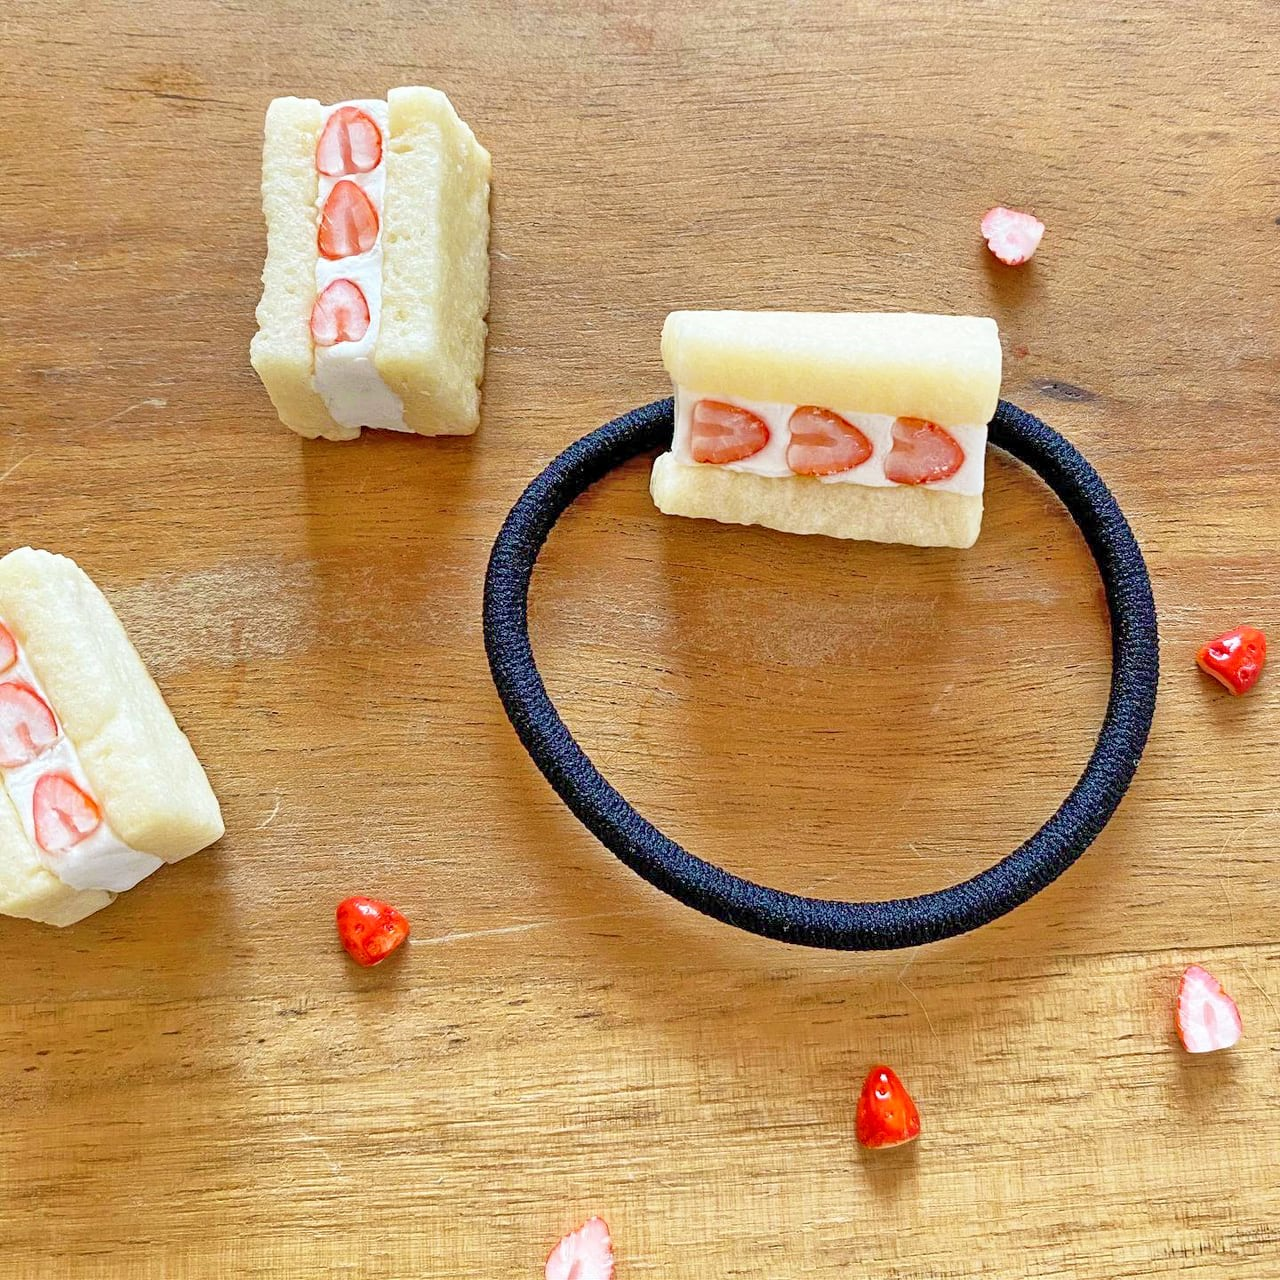 Bakery mokano  / いちごサンド ヘアゴム【受注制作】